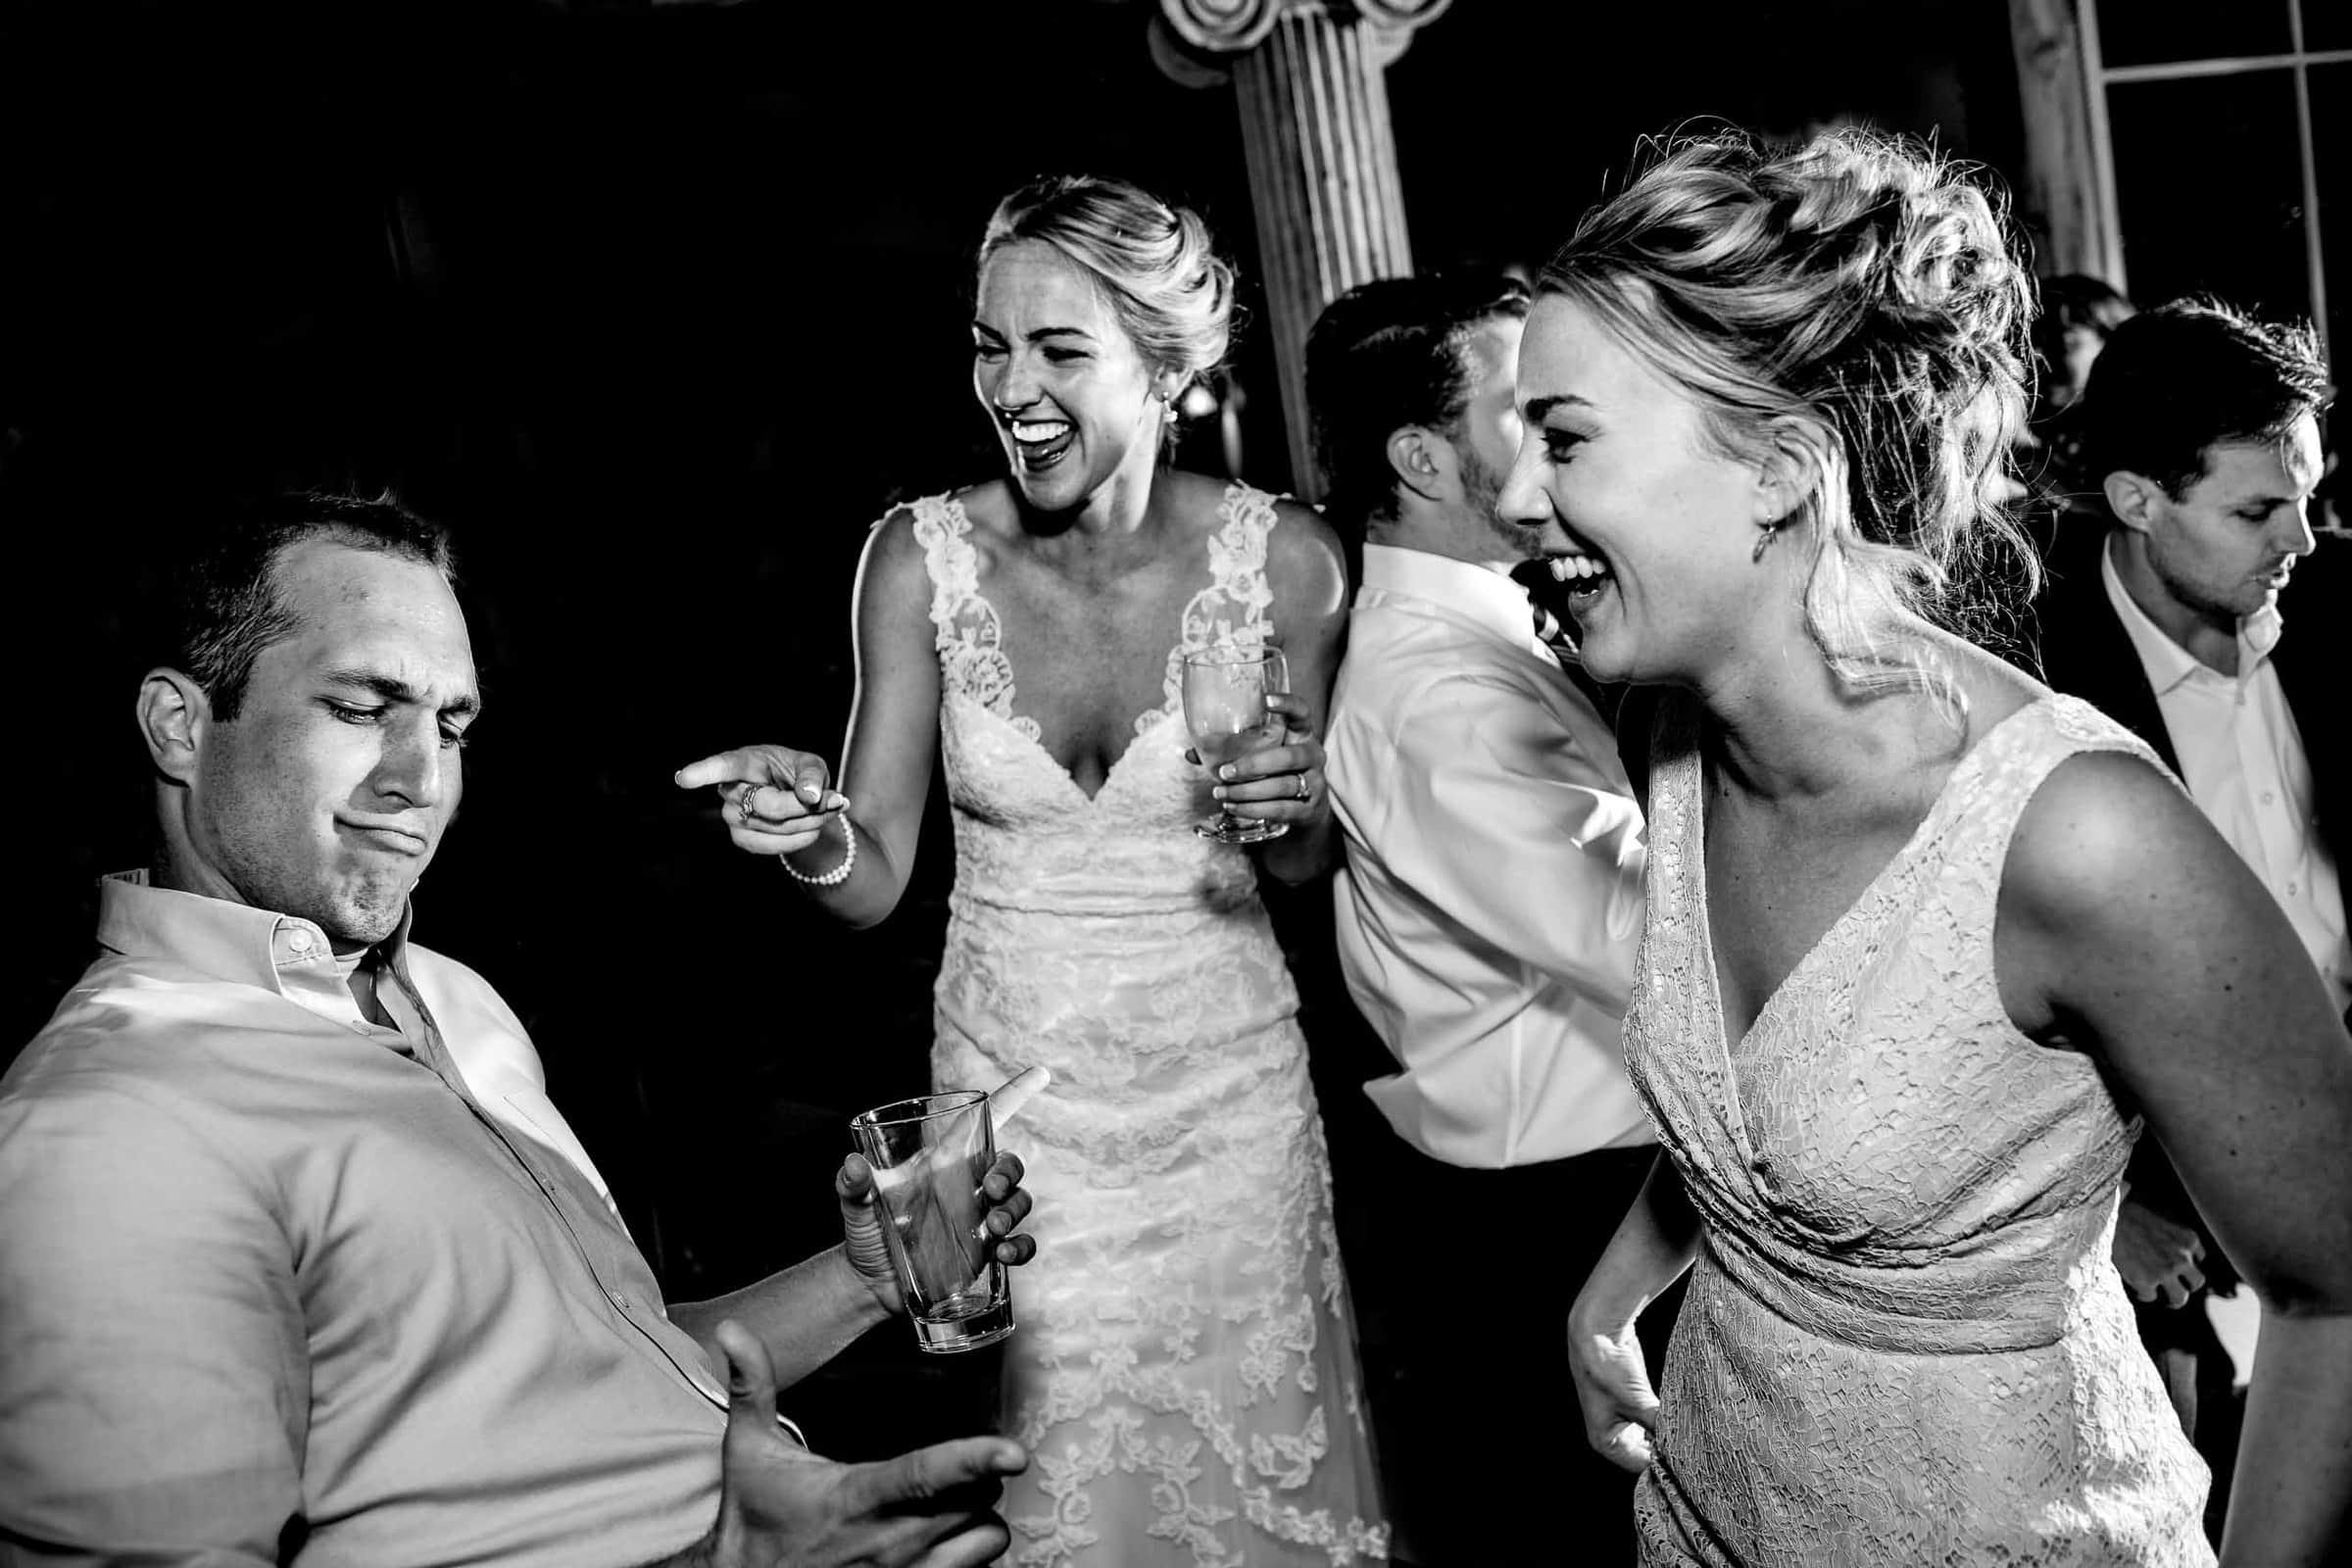 Fun dancing with bride and friends at a Mt Hood Organic Farms wedding reception near Hood River Oregon